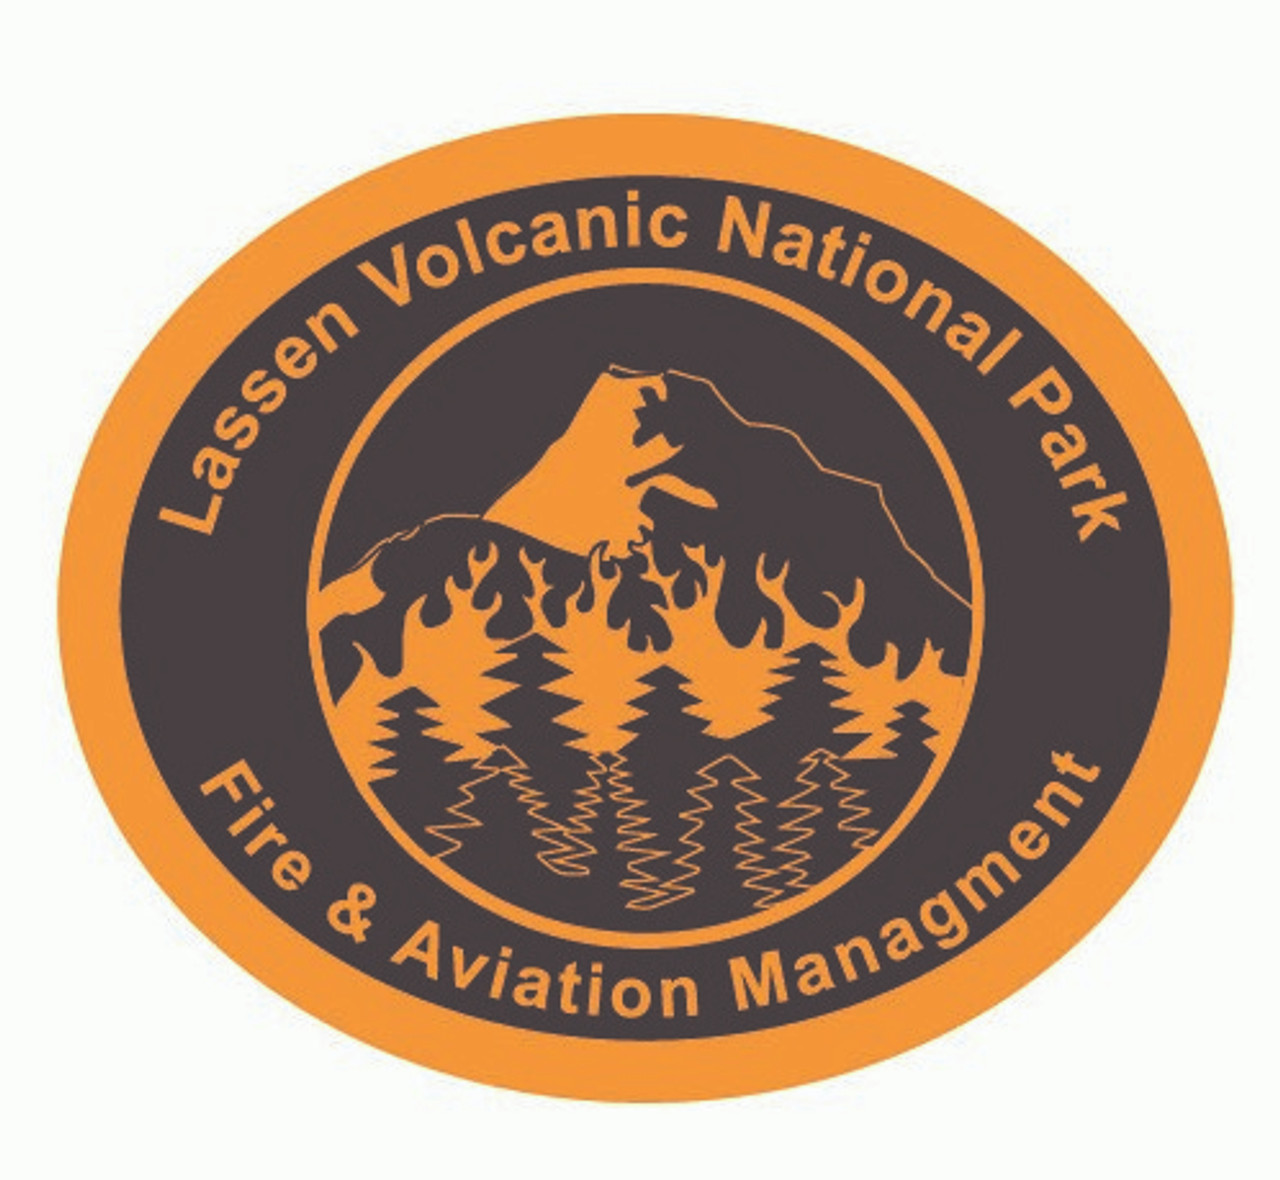 Lassen Volcanic National Park Fire & Aviation Management Buckle (RESTRICTED)